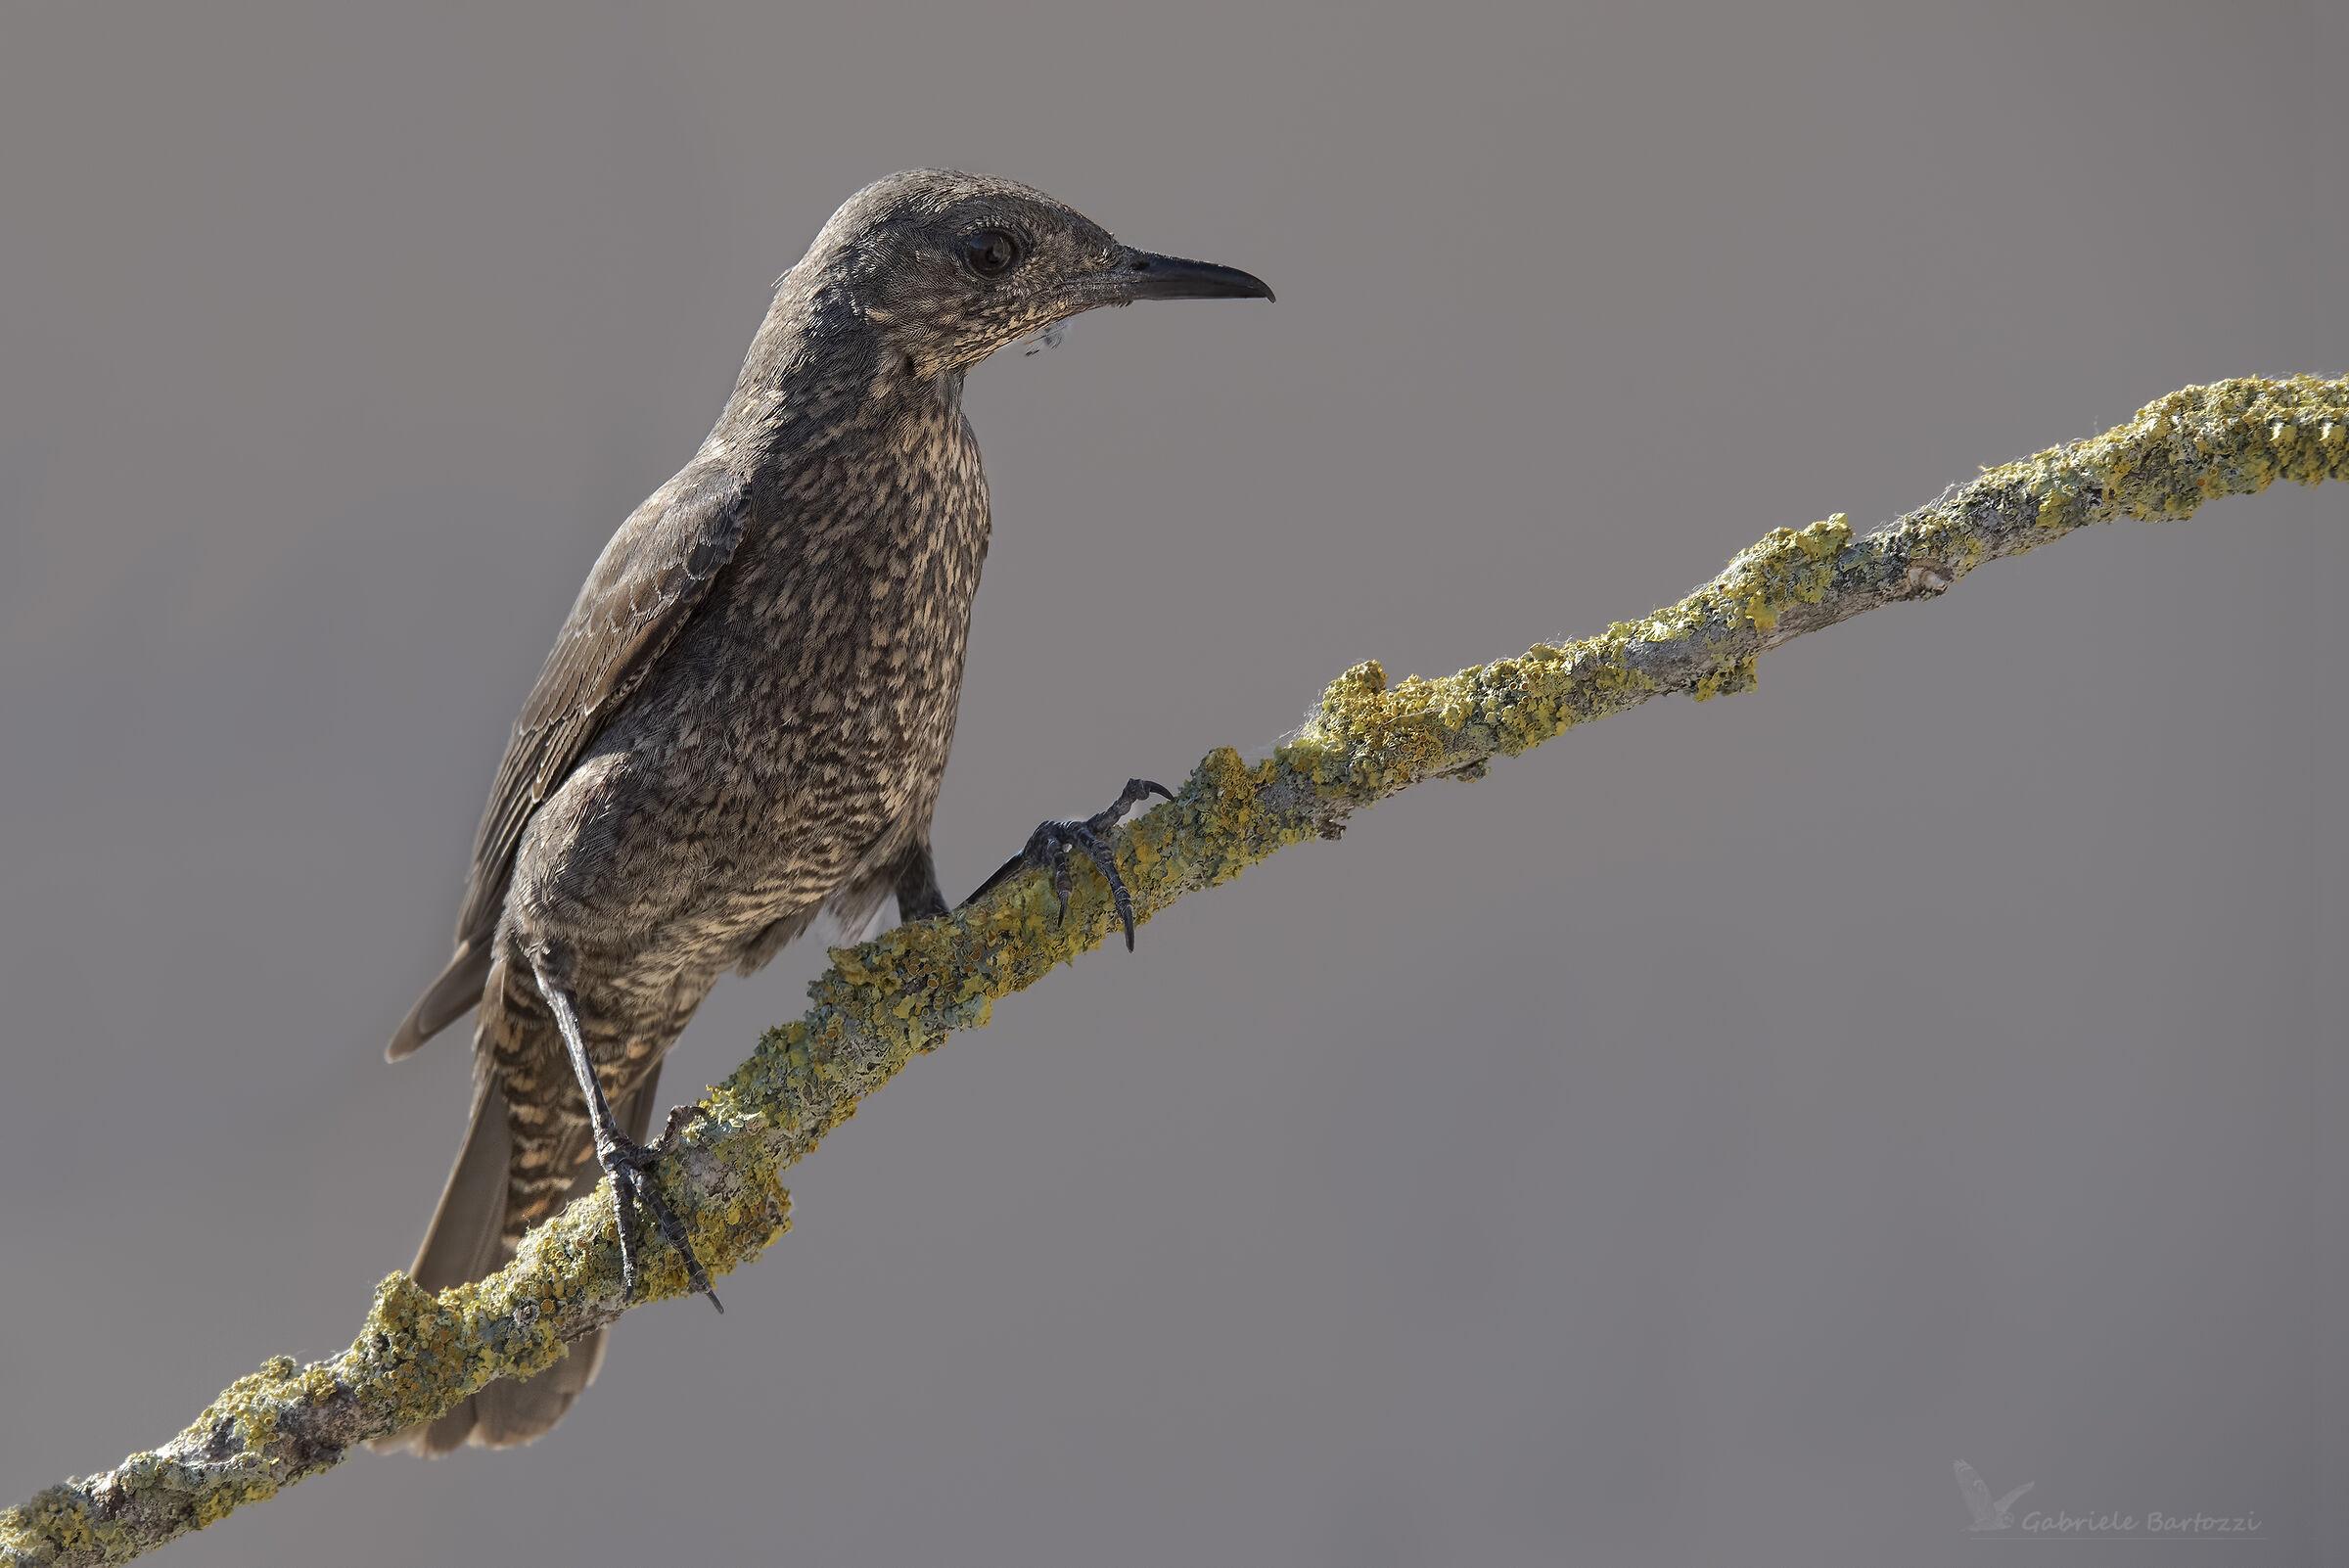 Female solitary sparrow...